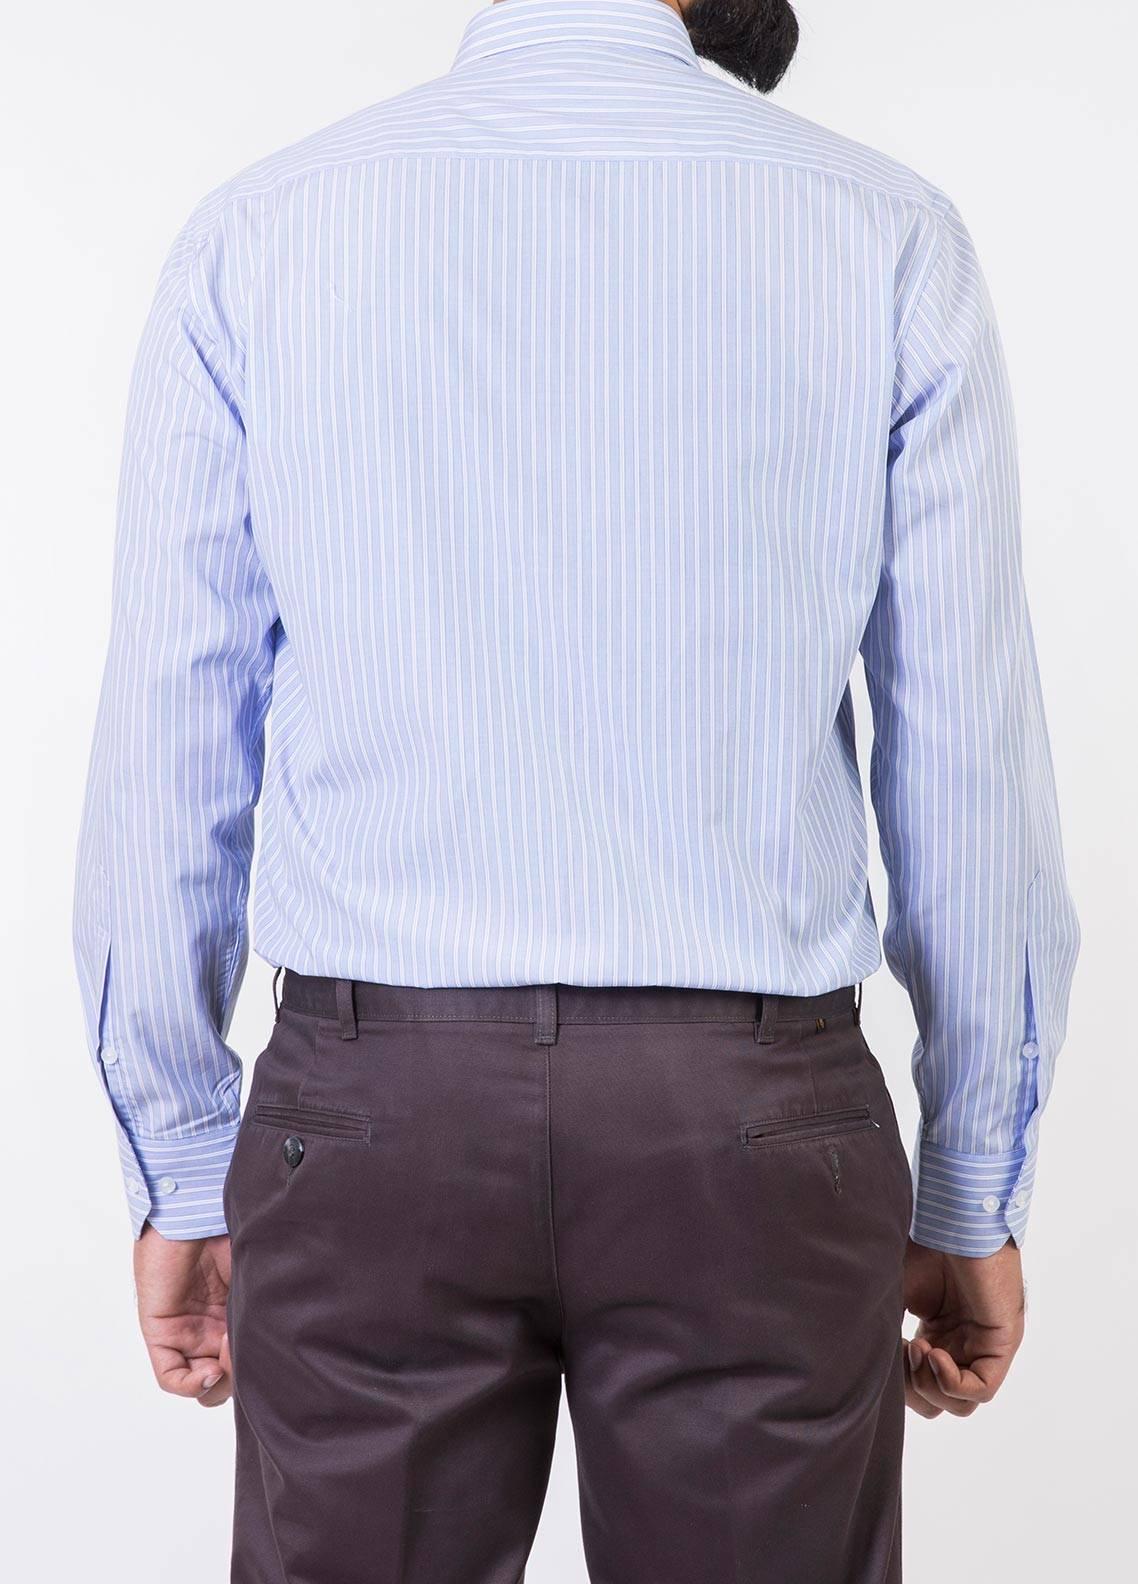 Bien Habille Cotton Formal Shirts for Men -   White & Dark Blue Lining